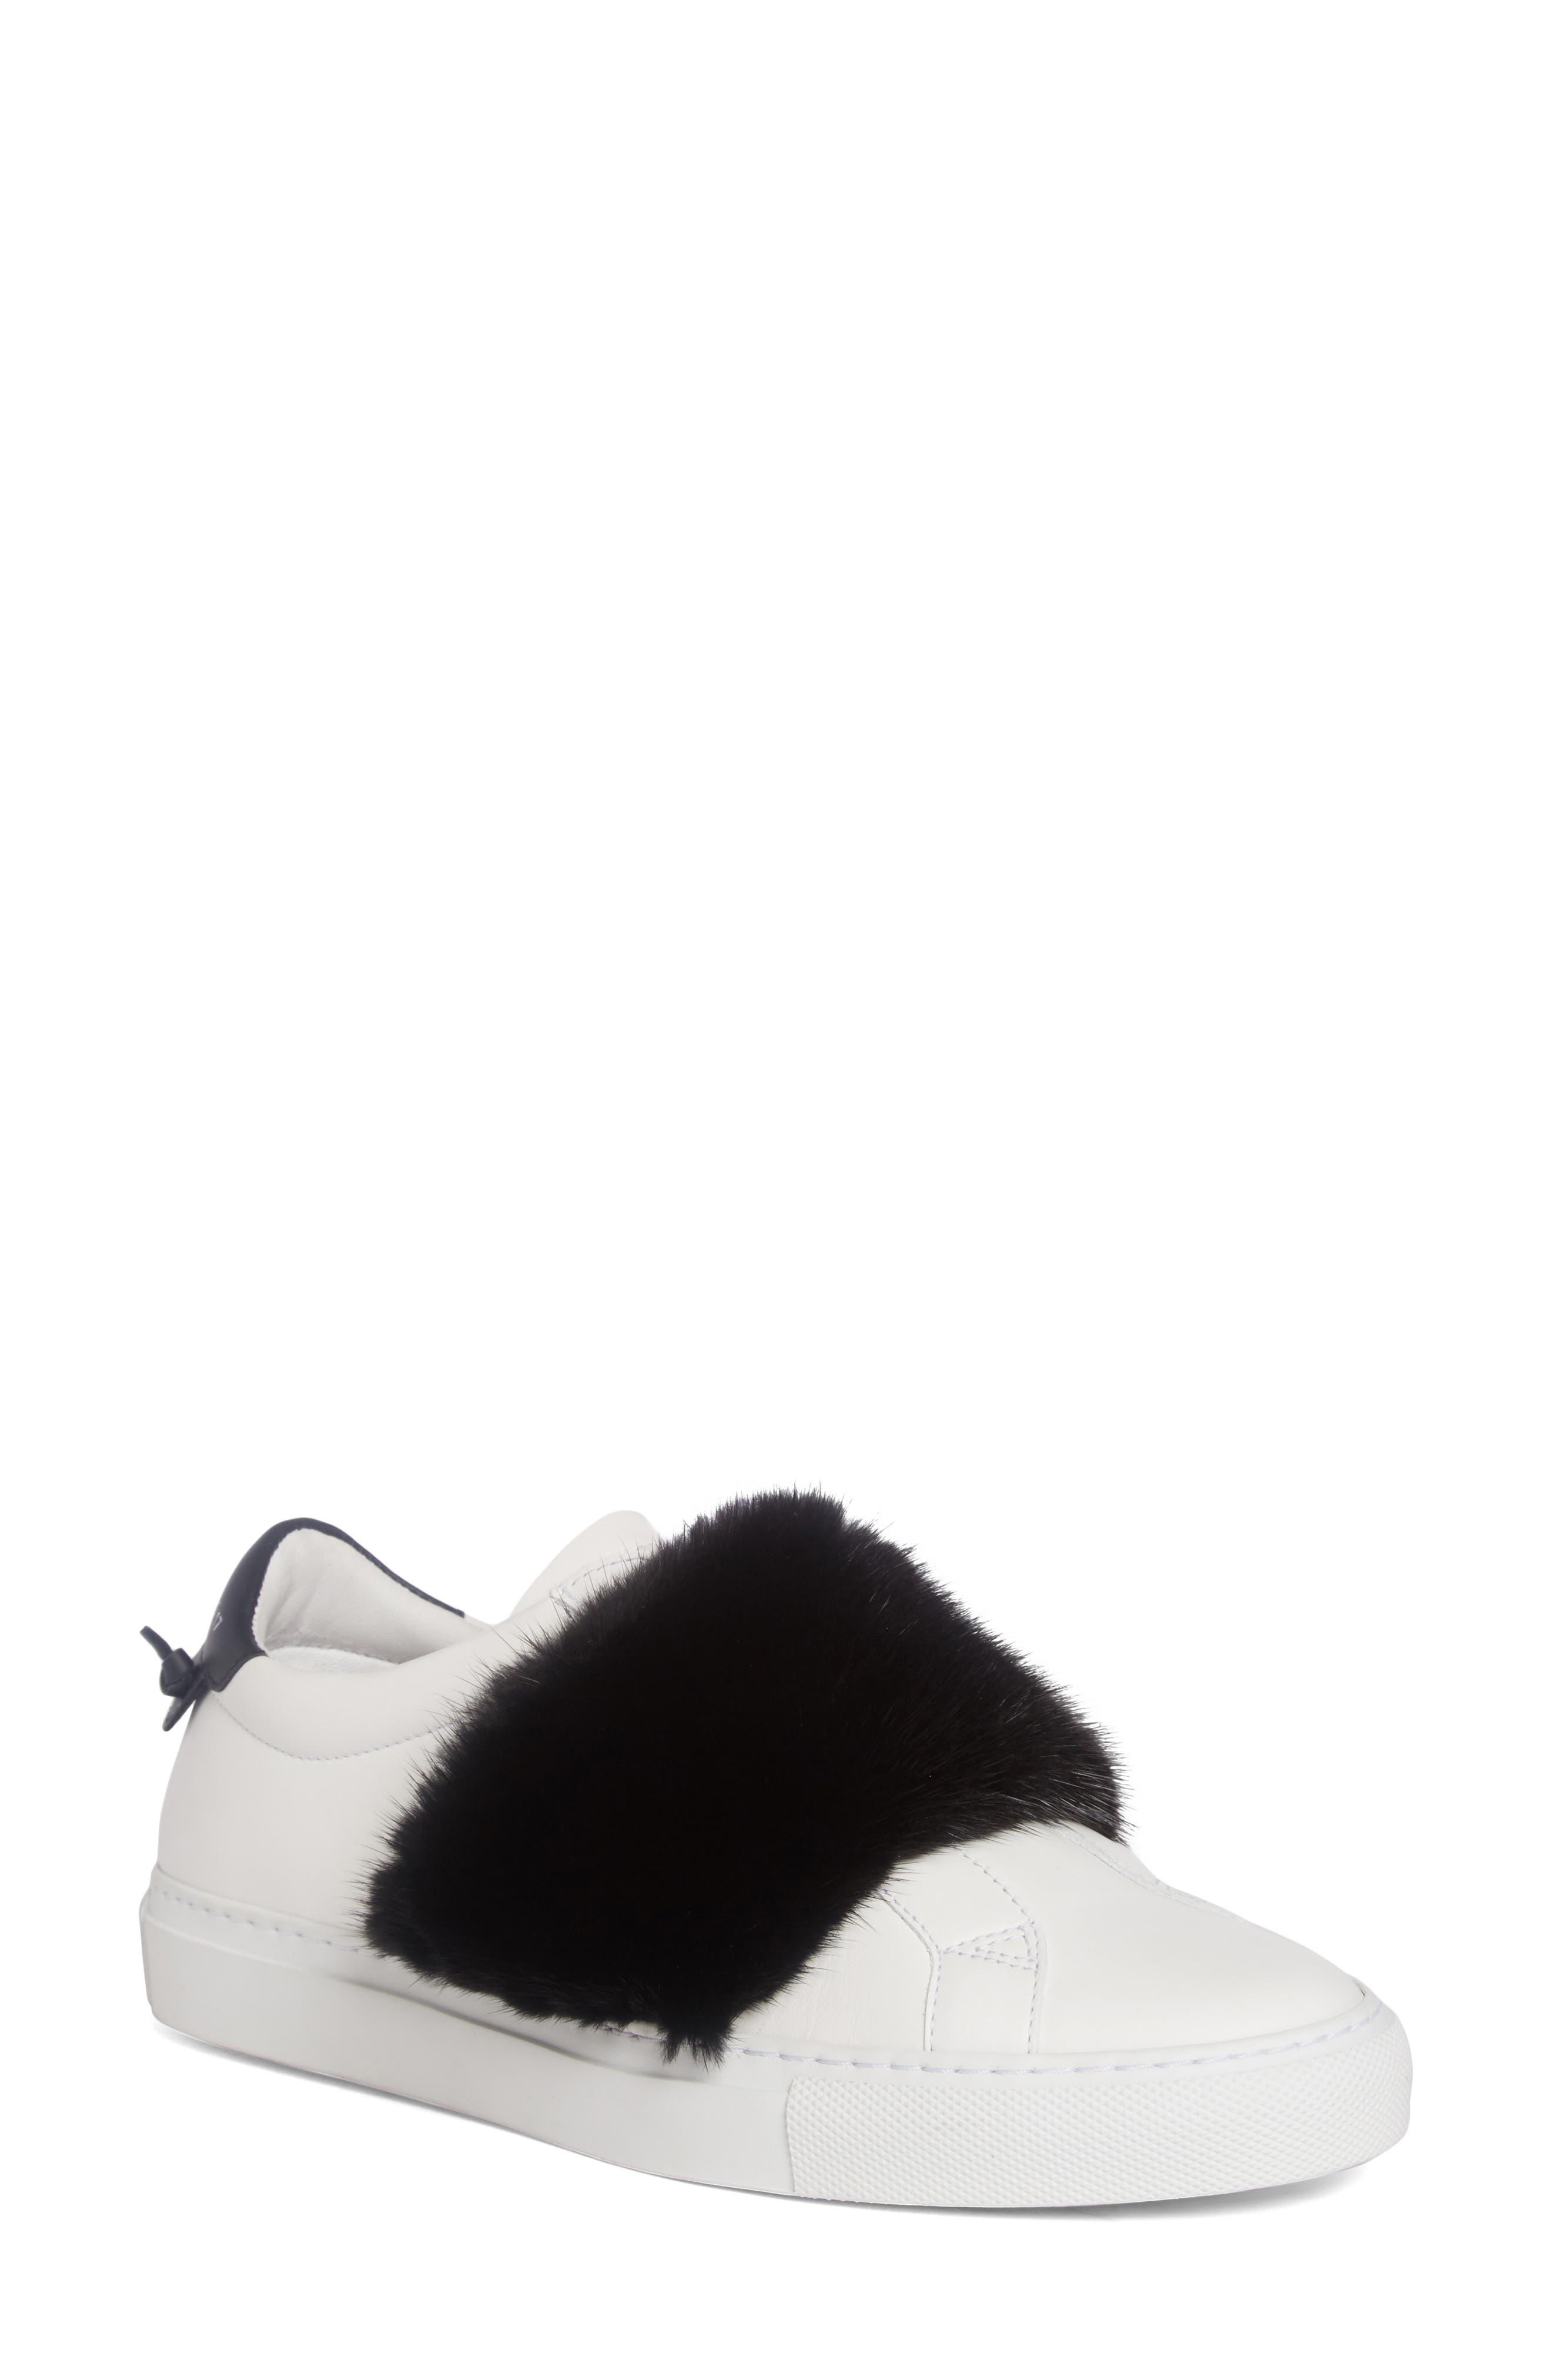 Urban Street Slip-On Sneaker with Genuine Mink Fur Trim,                             Main thumbnail 4, color,